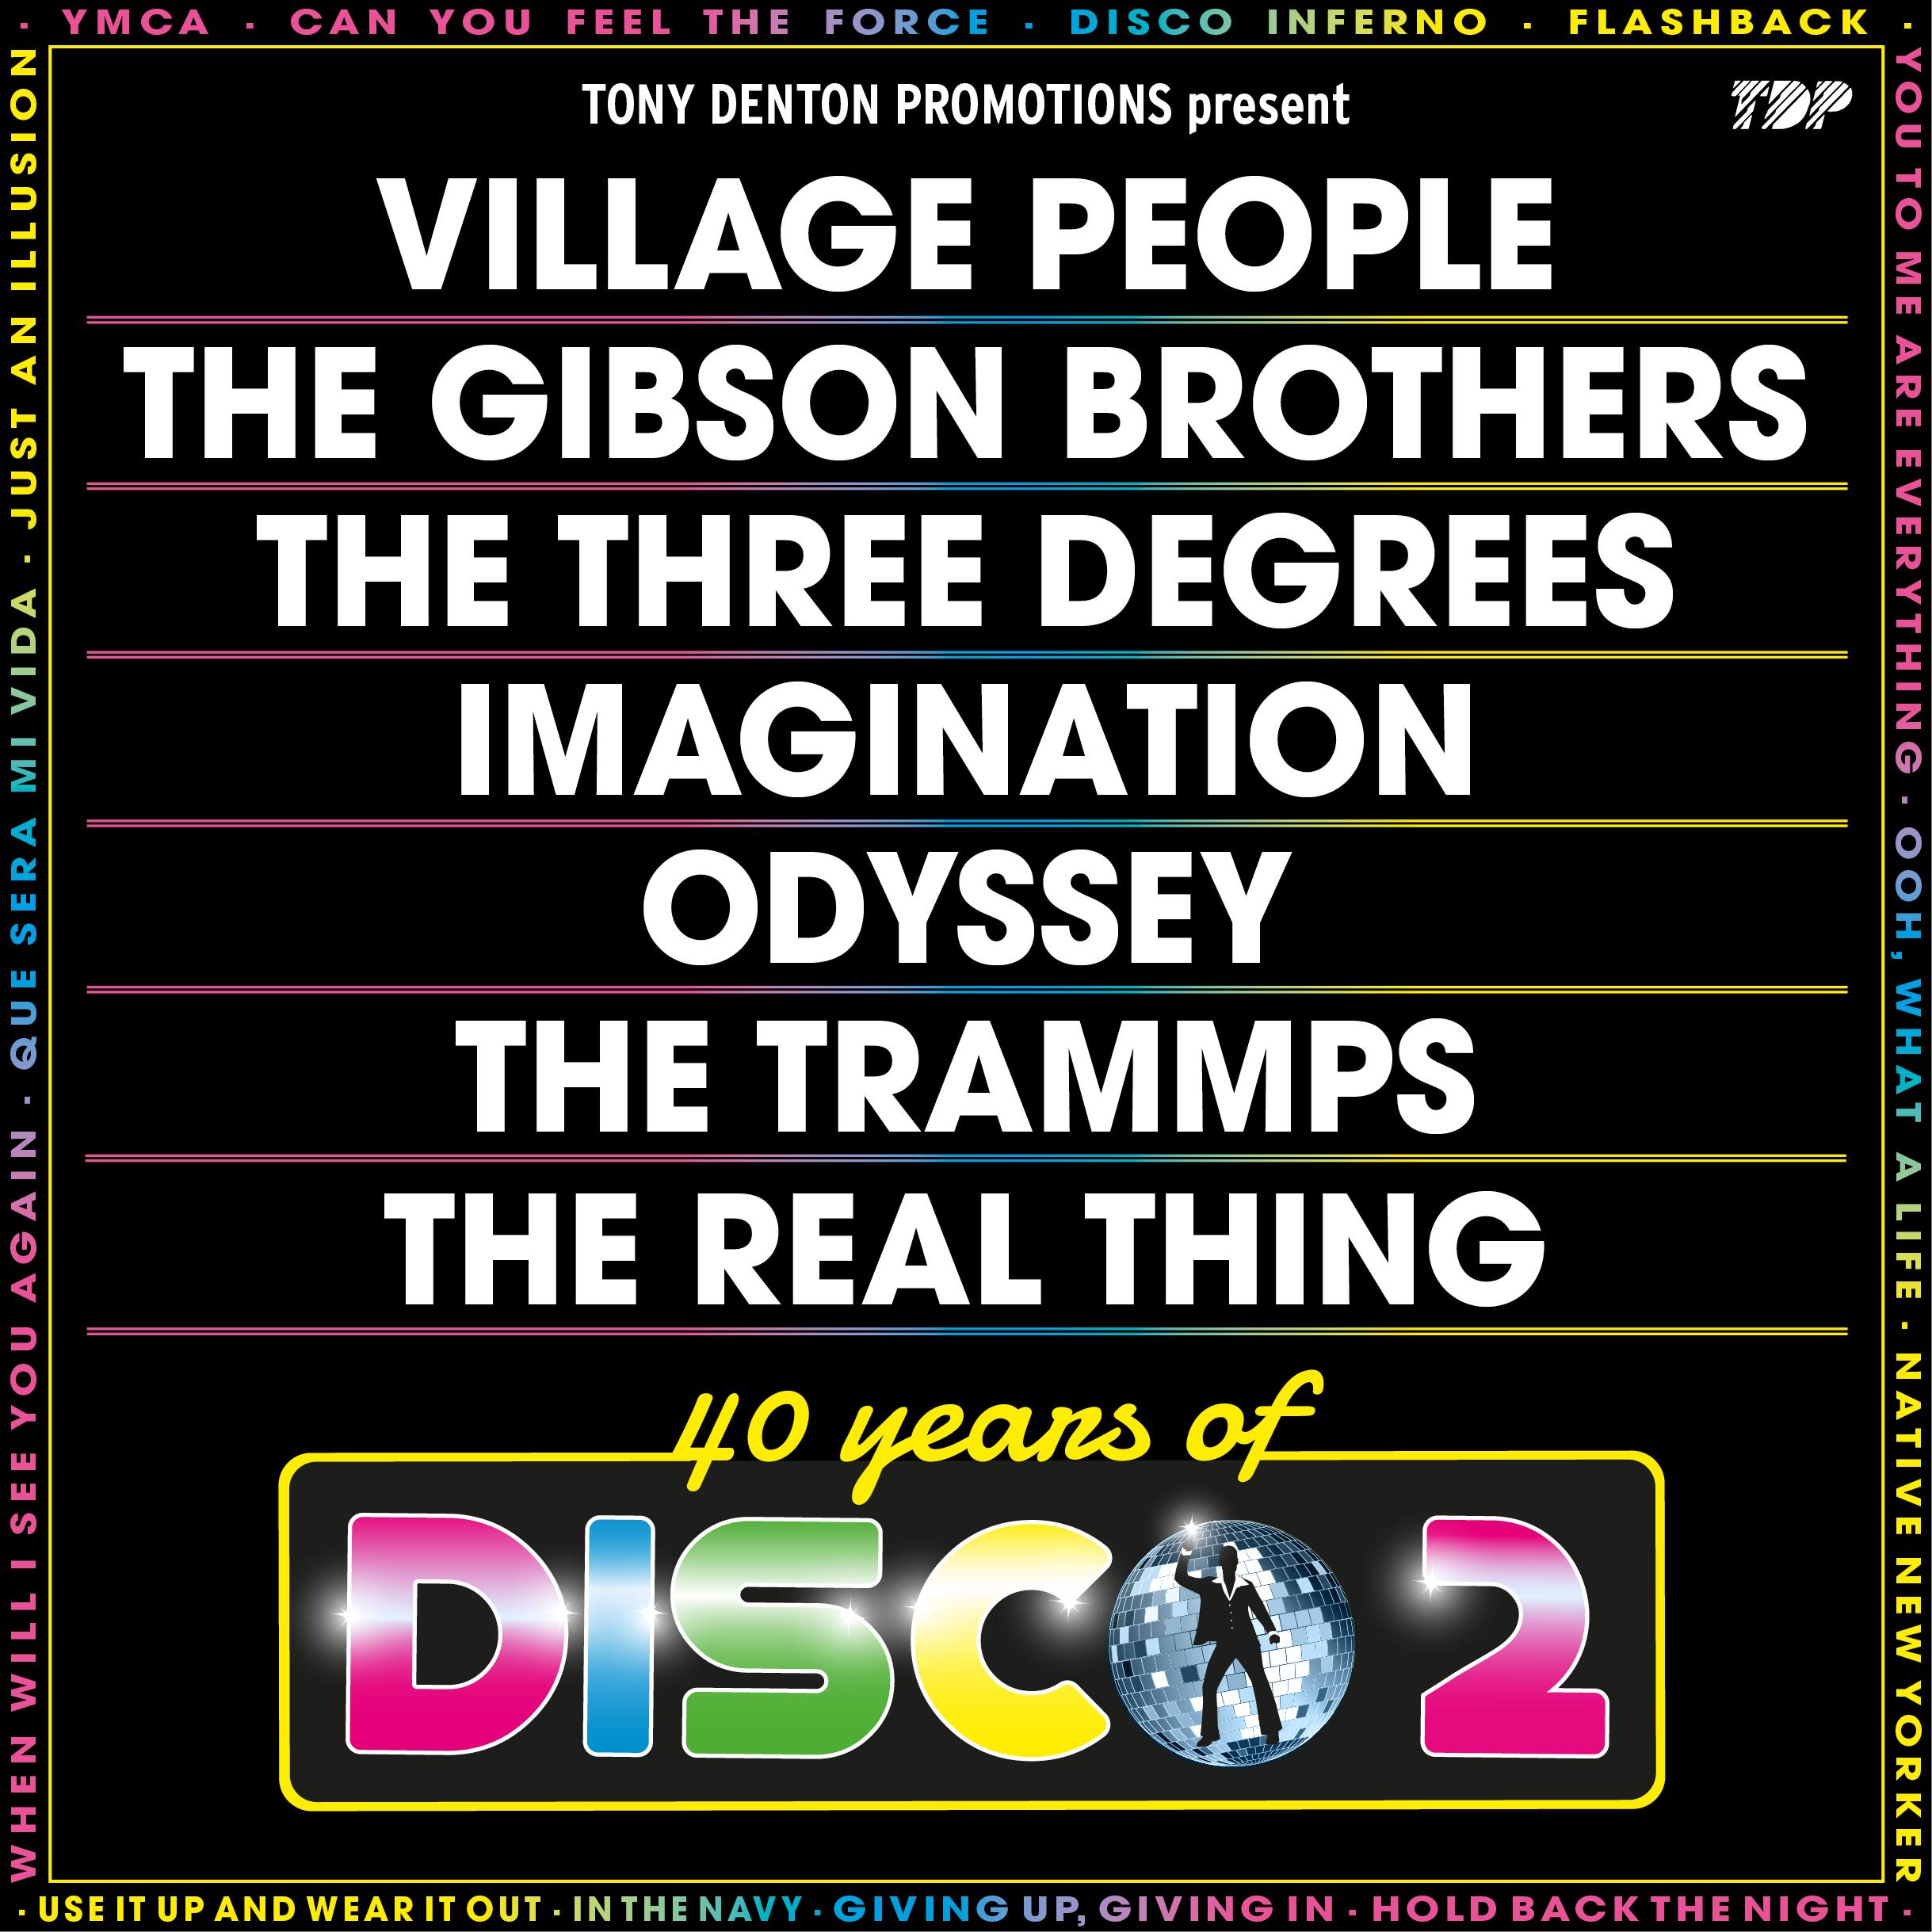 40-years-of-disco